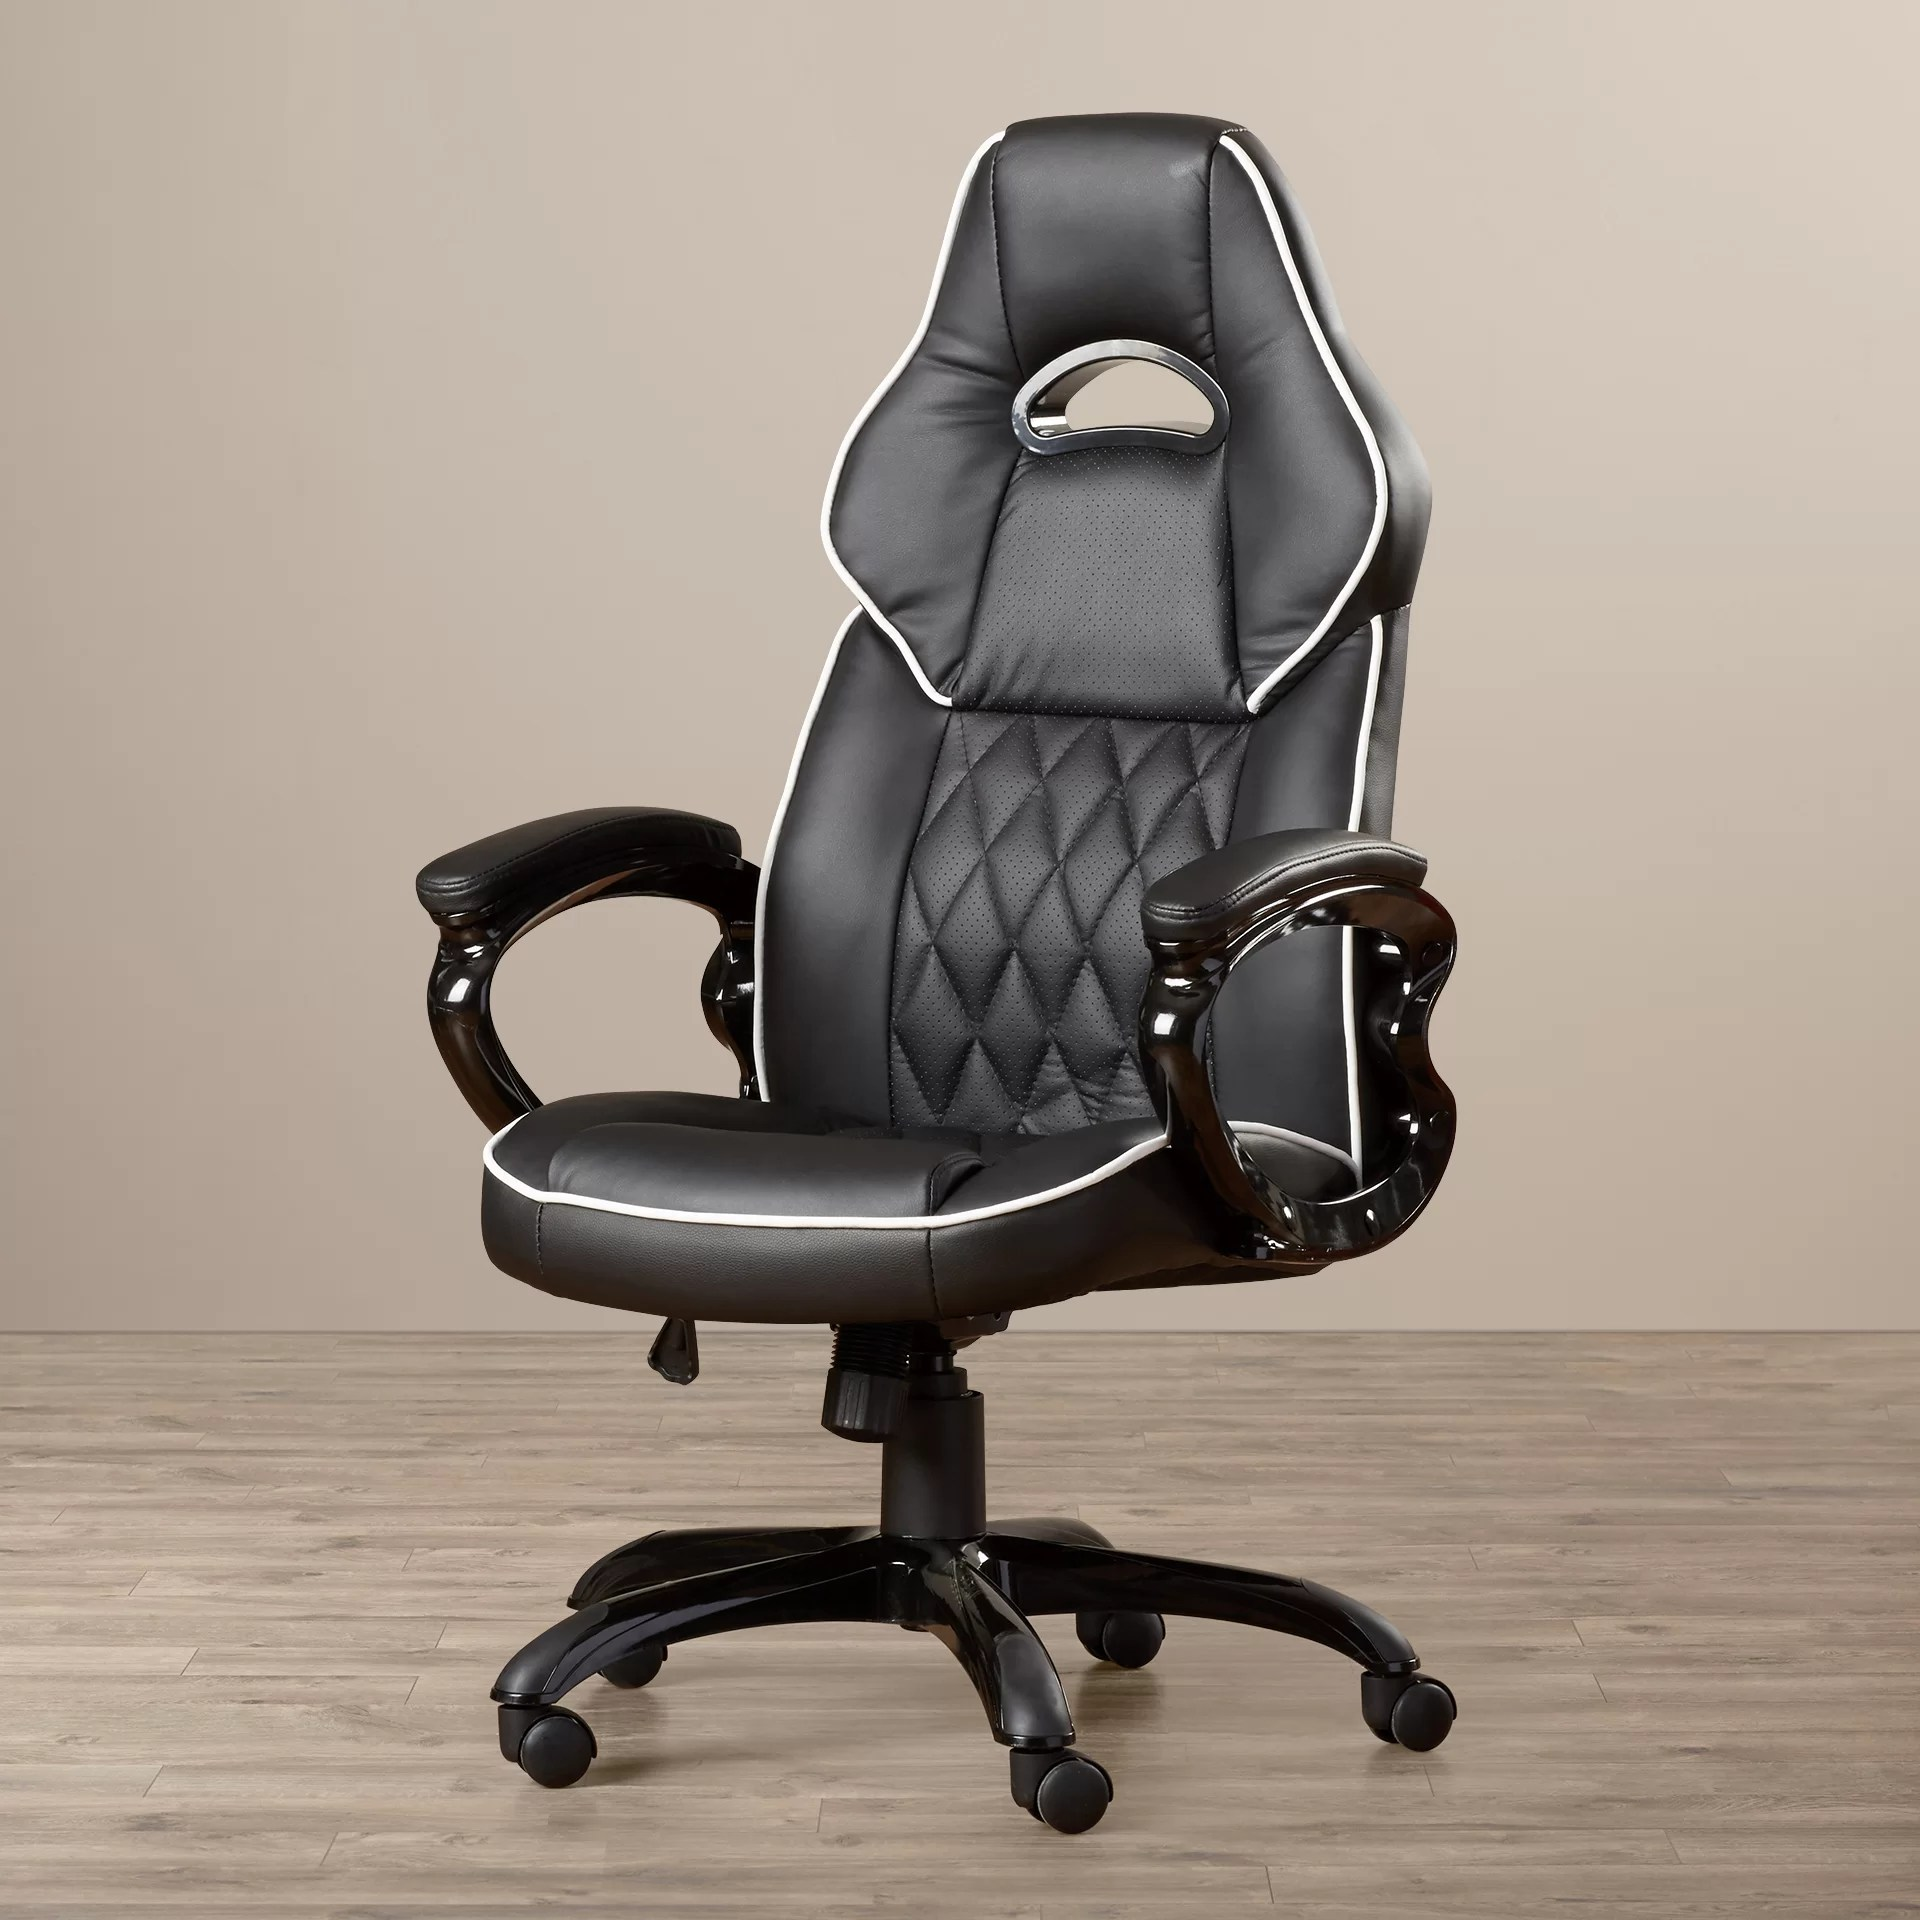 office chair high seat wooden rocking chairs nursery wade logan fairfax back executive